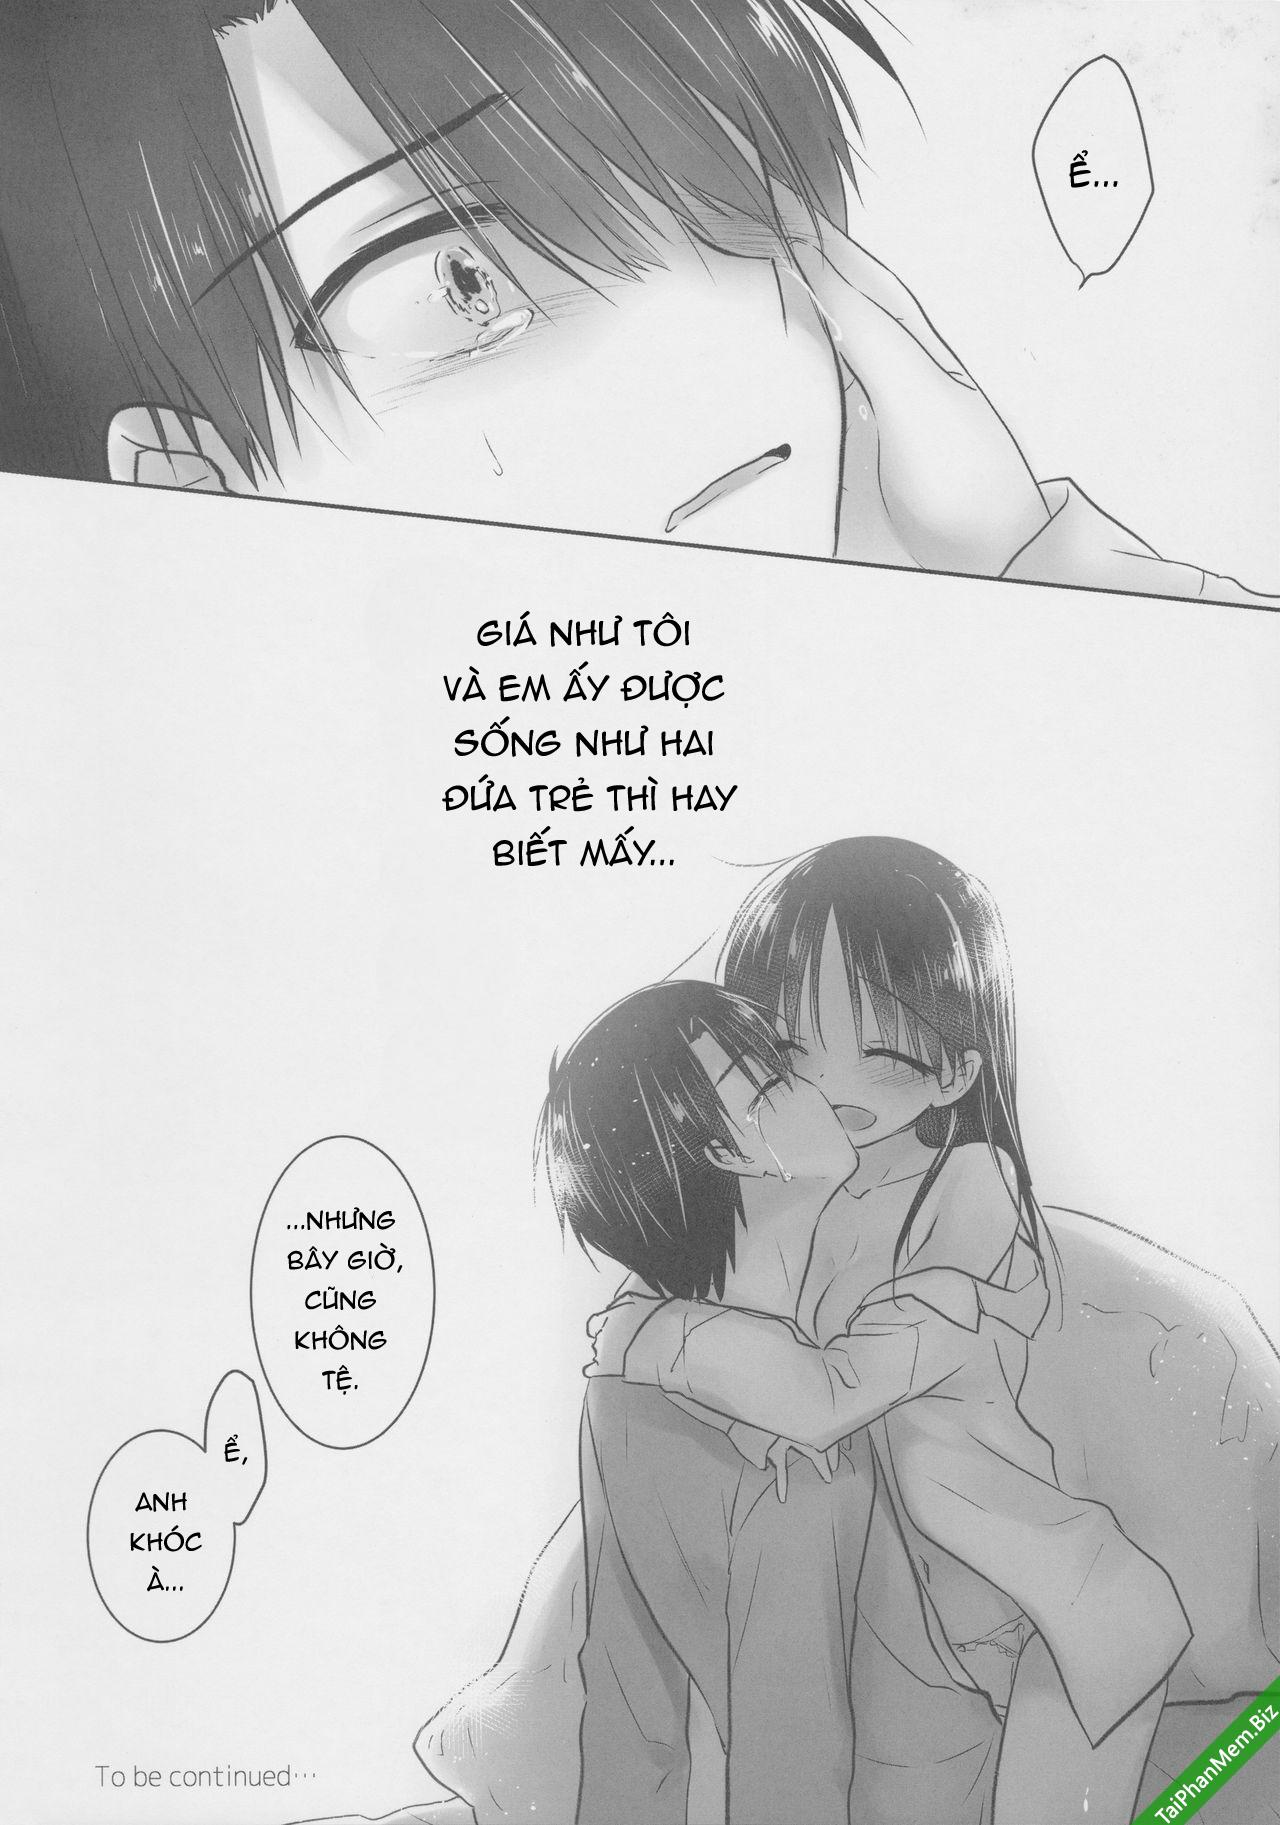 HentaiVN.net - Ảnh 47 - Omocha Sex - Chap 5